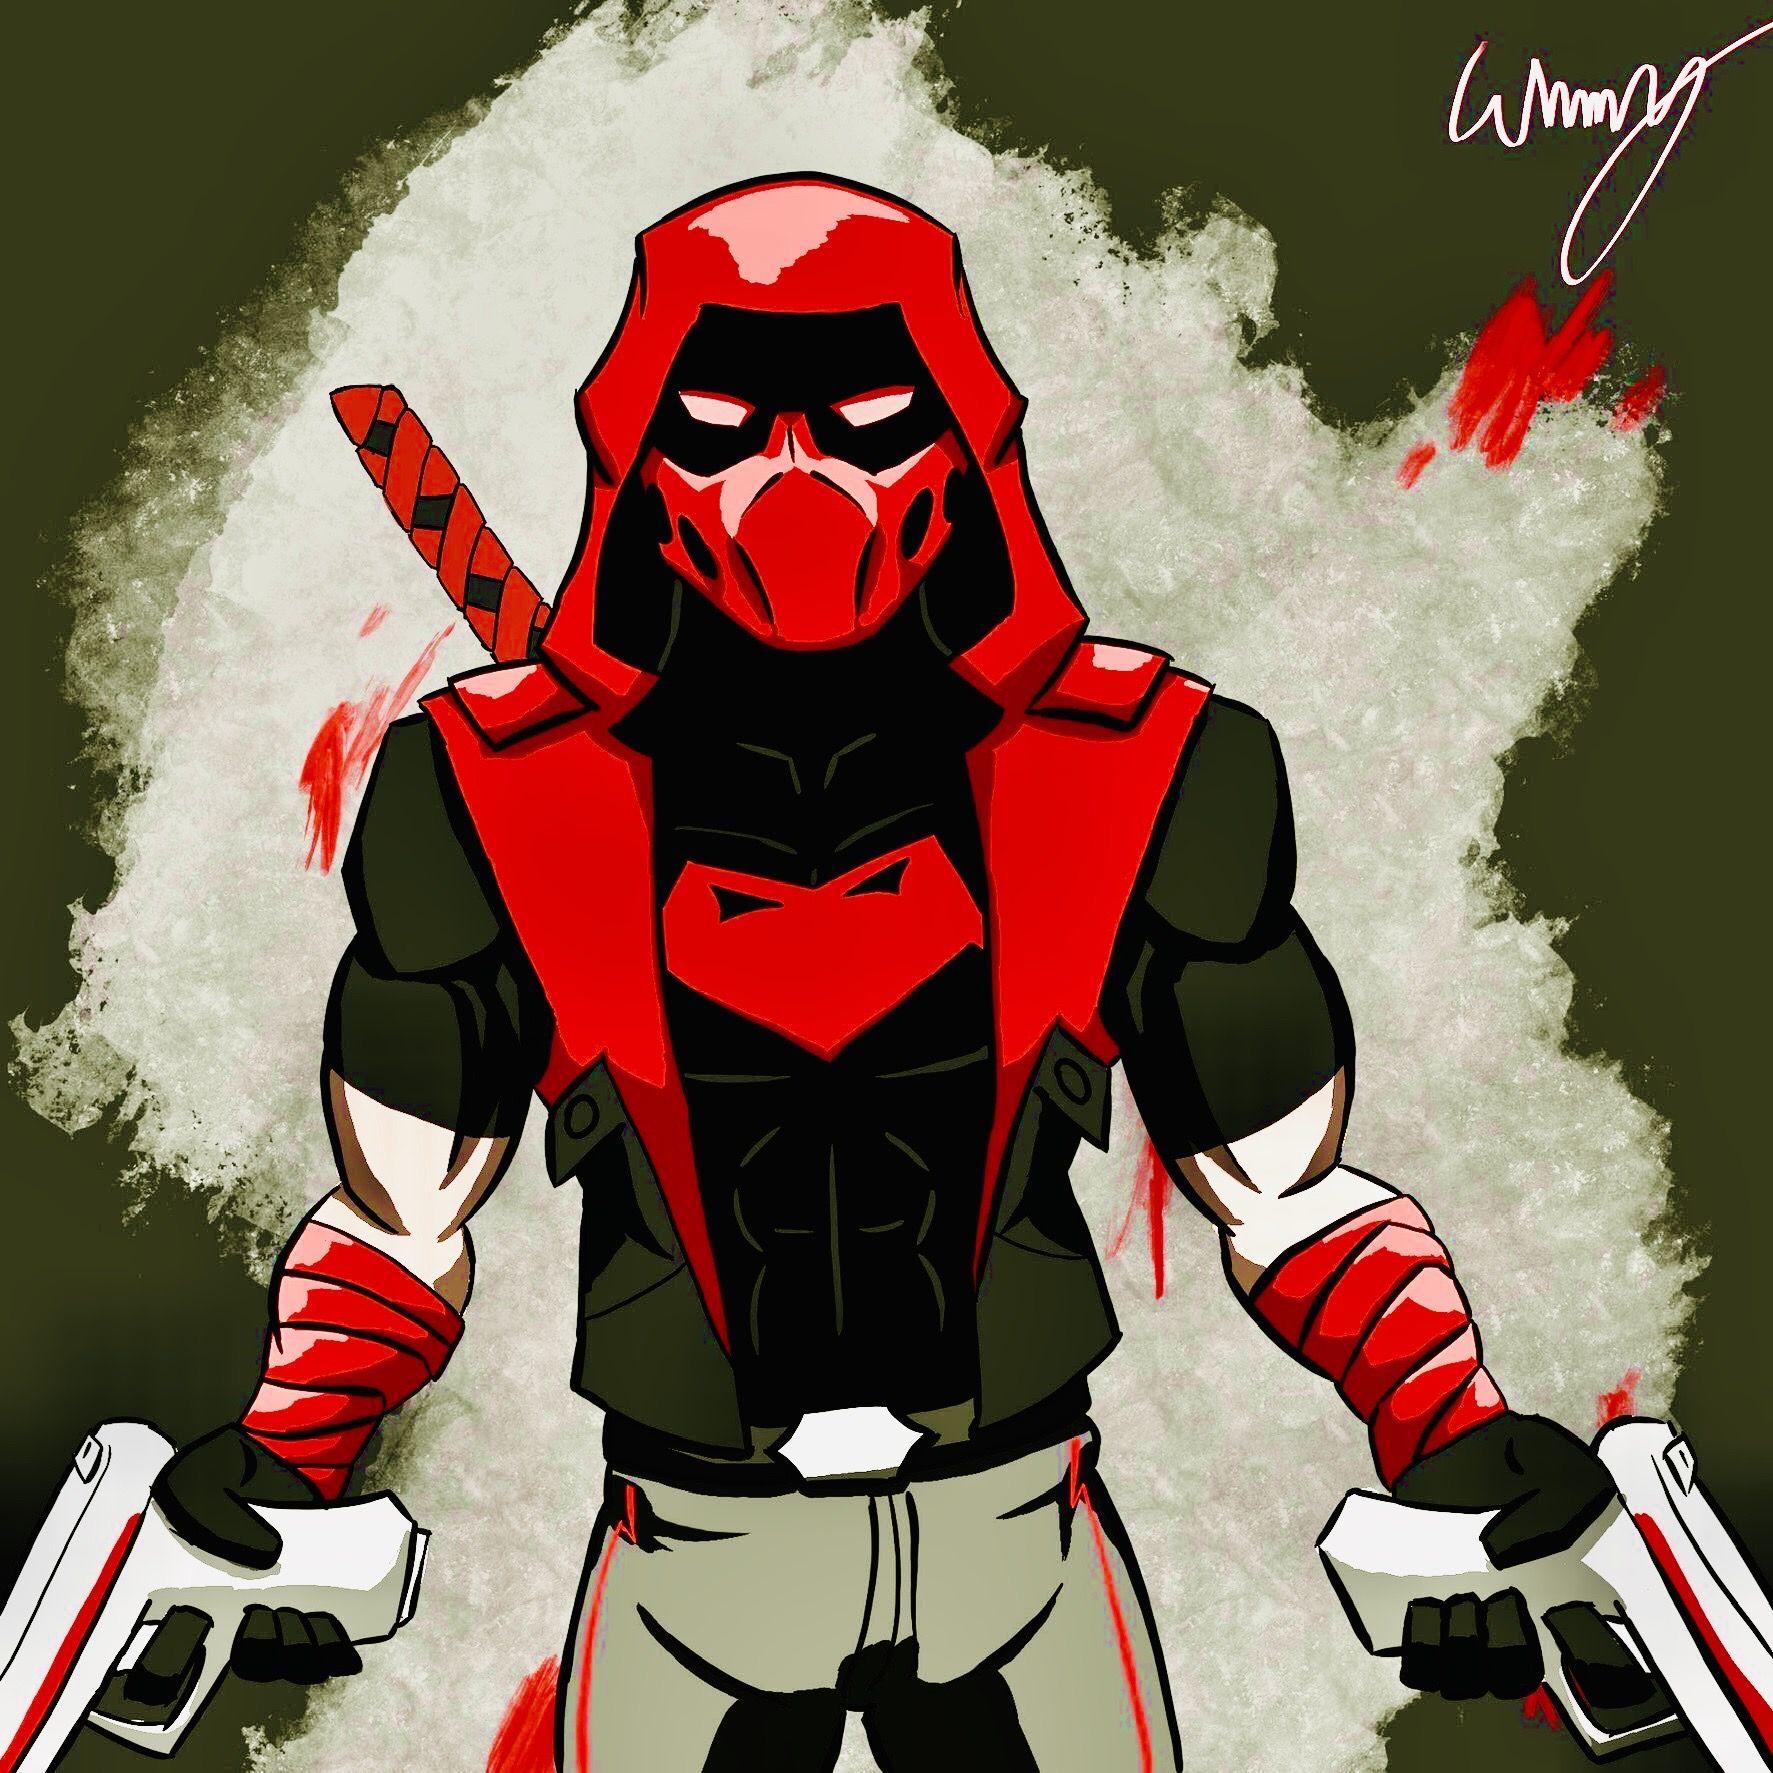 DC Comics Jason Todd Superhero HD Red Hood Wallpapers | HD